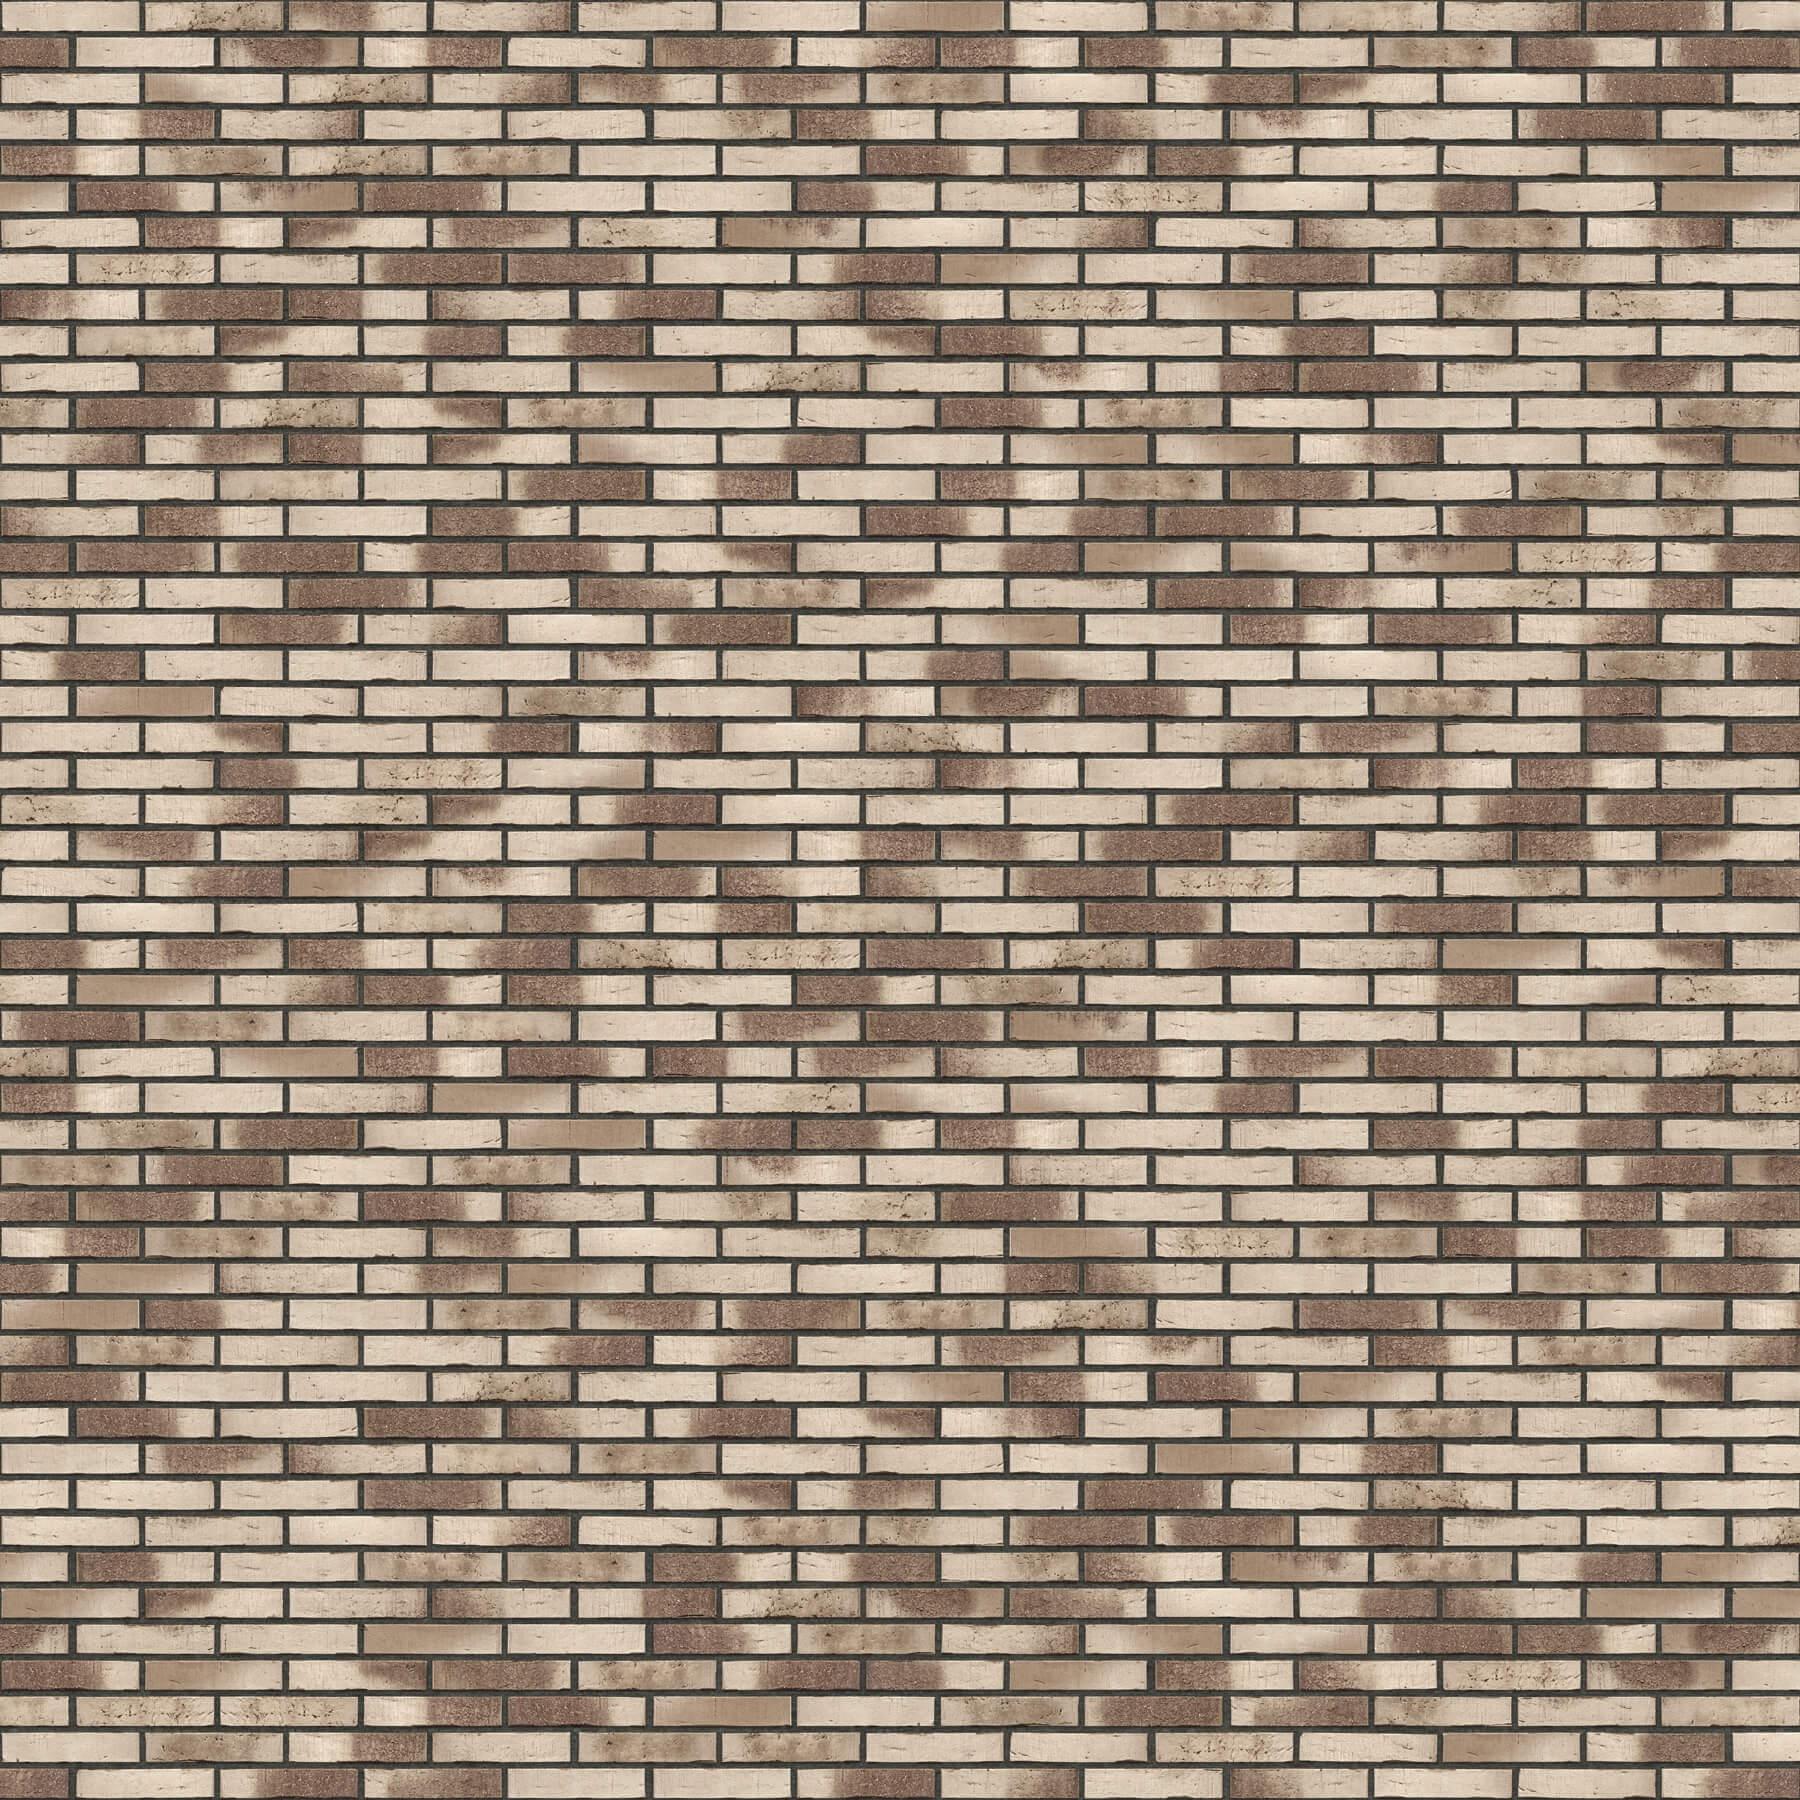 Puna-cigla-FeldHaus-Klinker-brick-house-beograd-df-k-948-Antracit Fuga